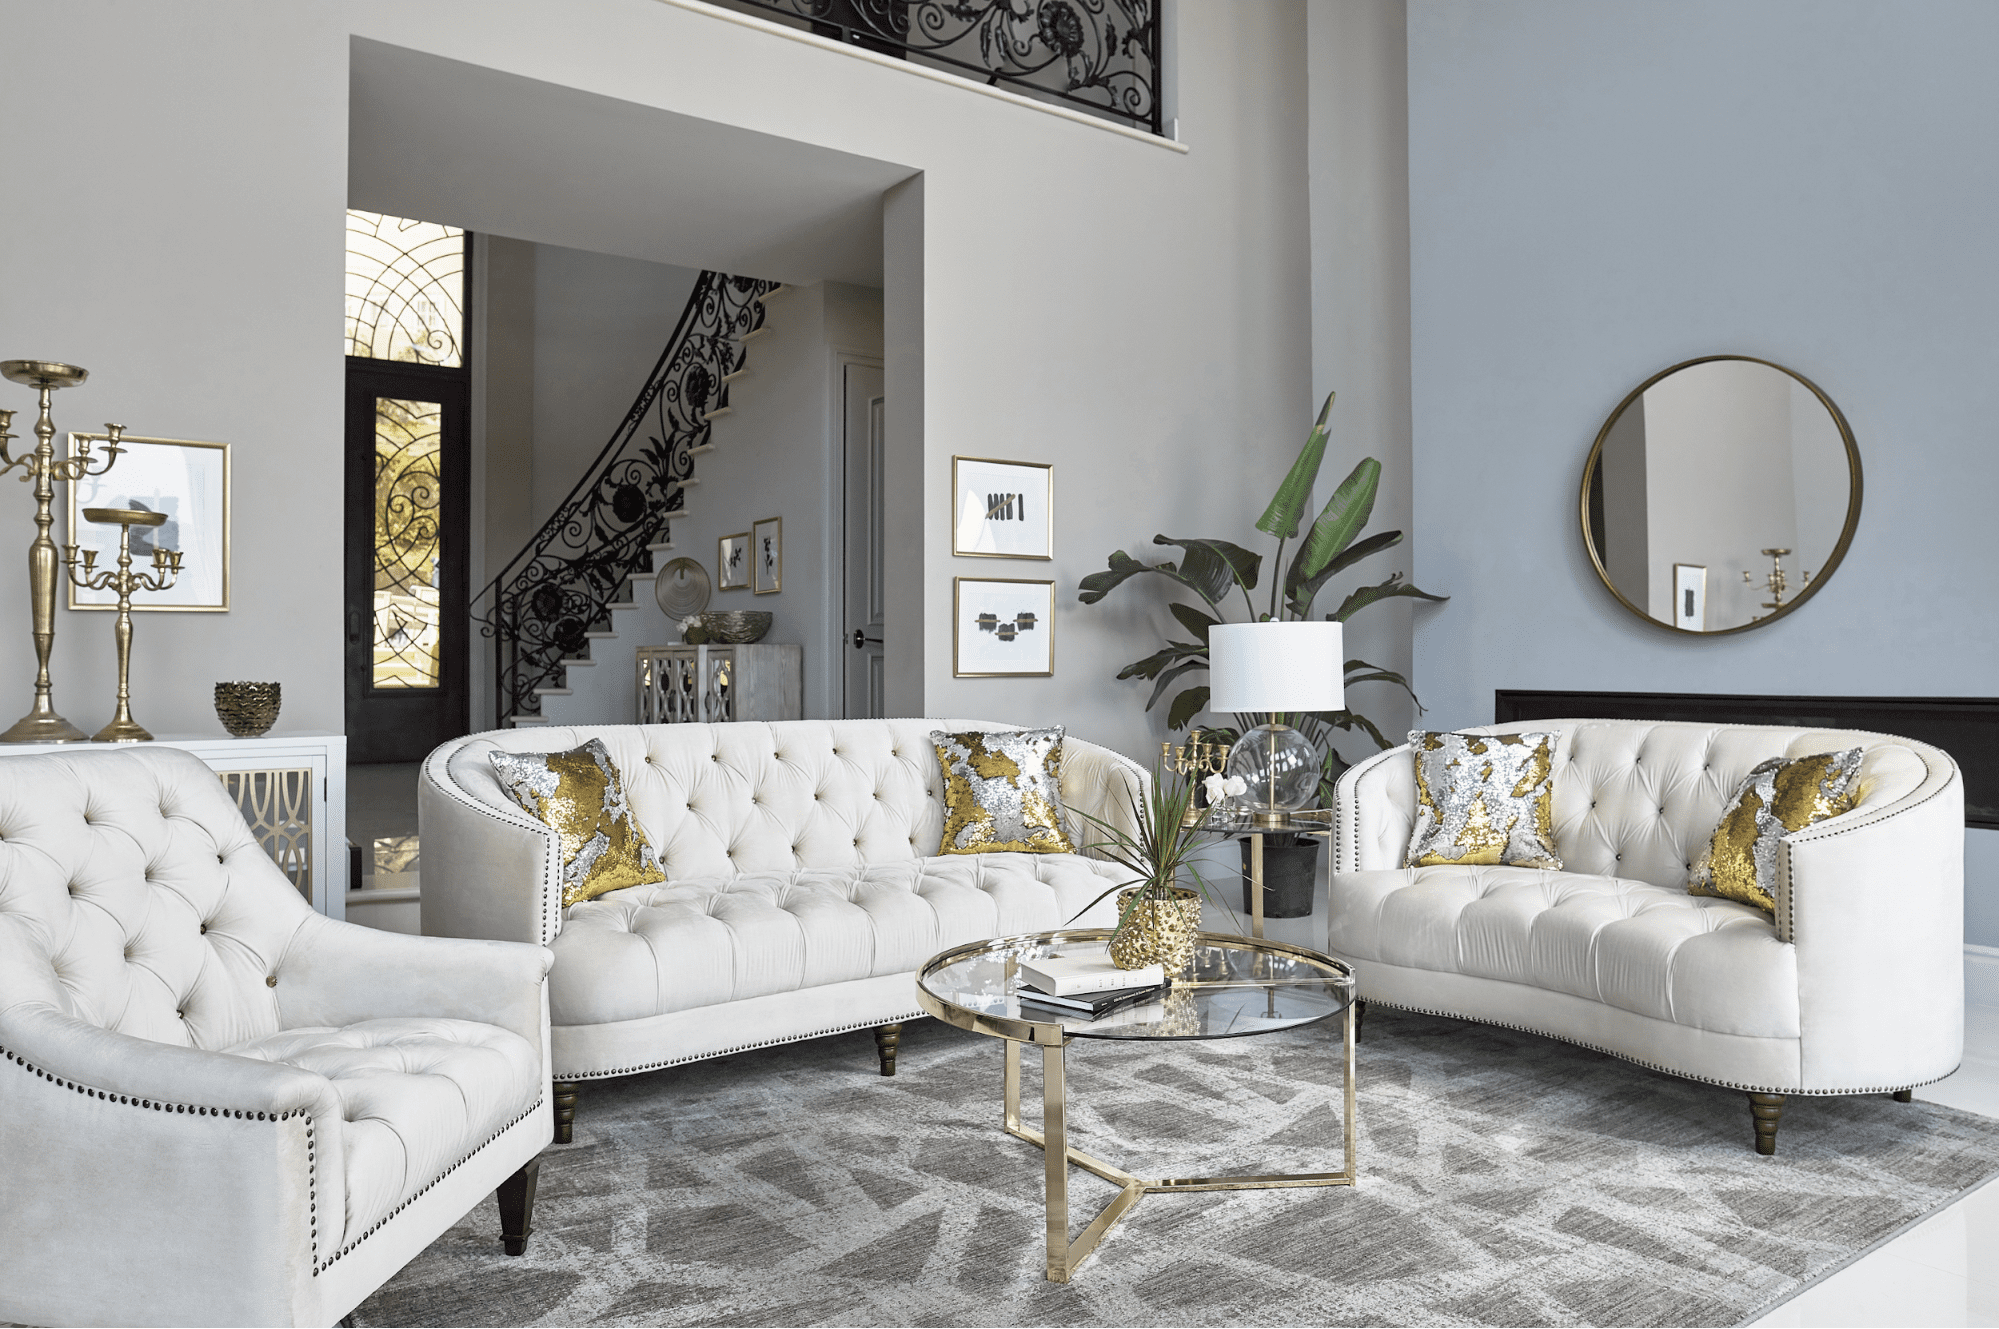 contemporary living room: Avonlea 2-Piece Upholstered Sloped Arm Living Room Set Off White